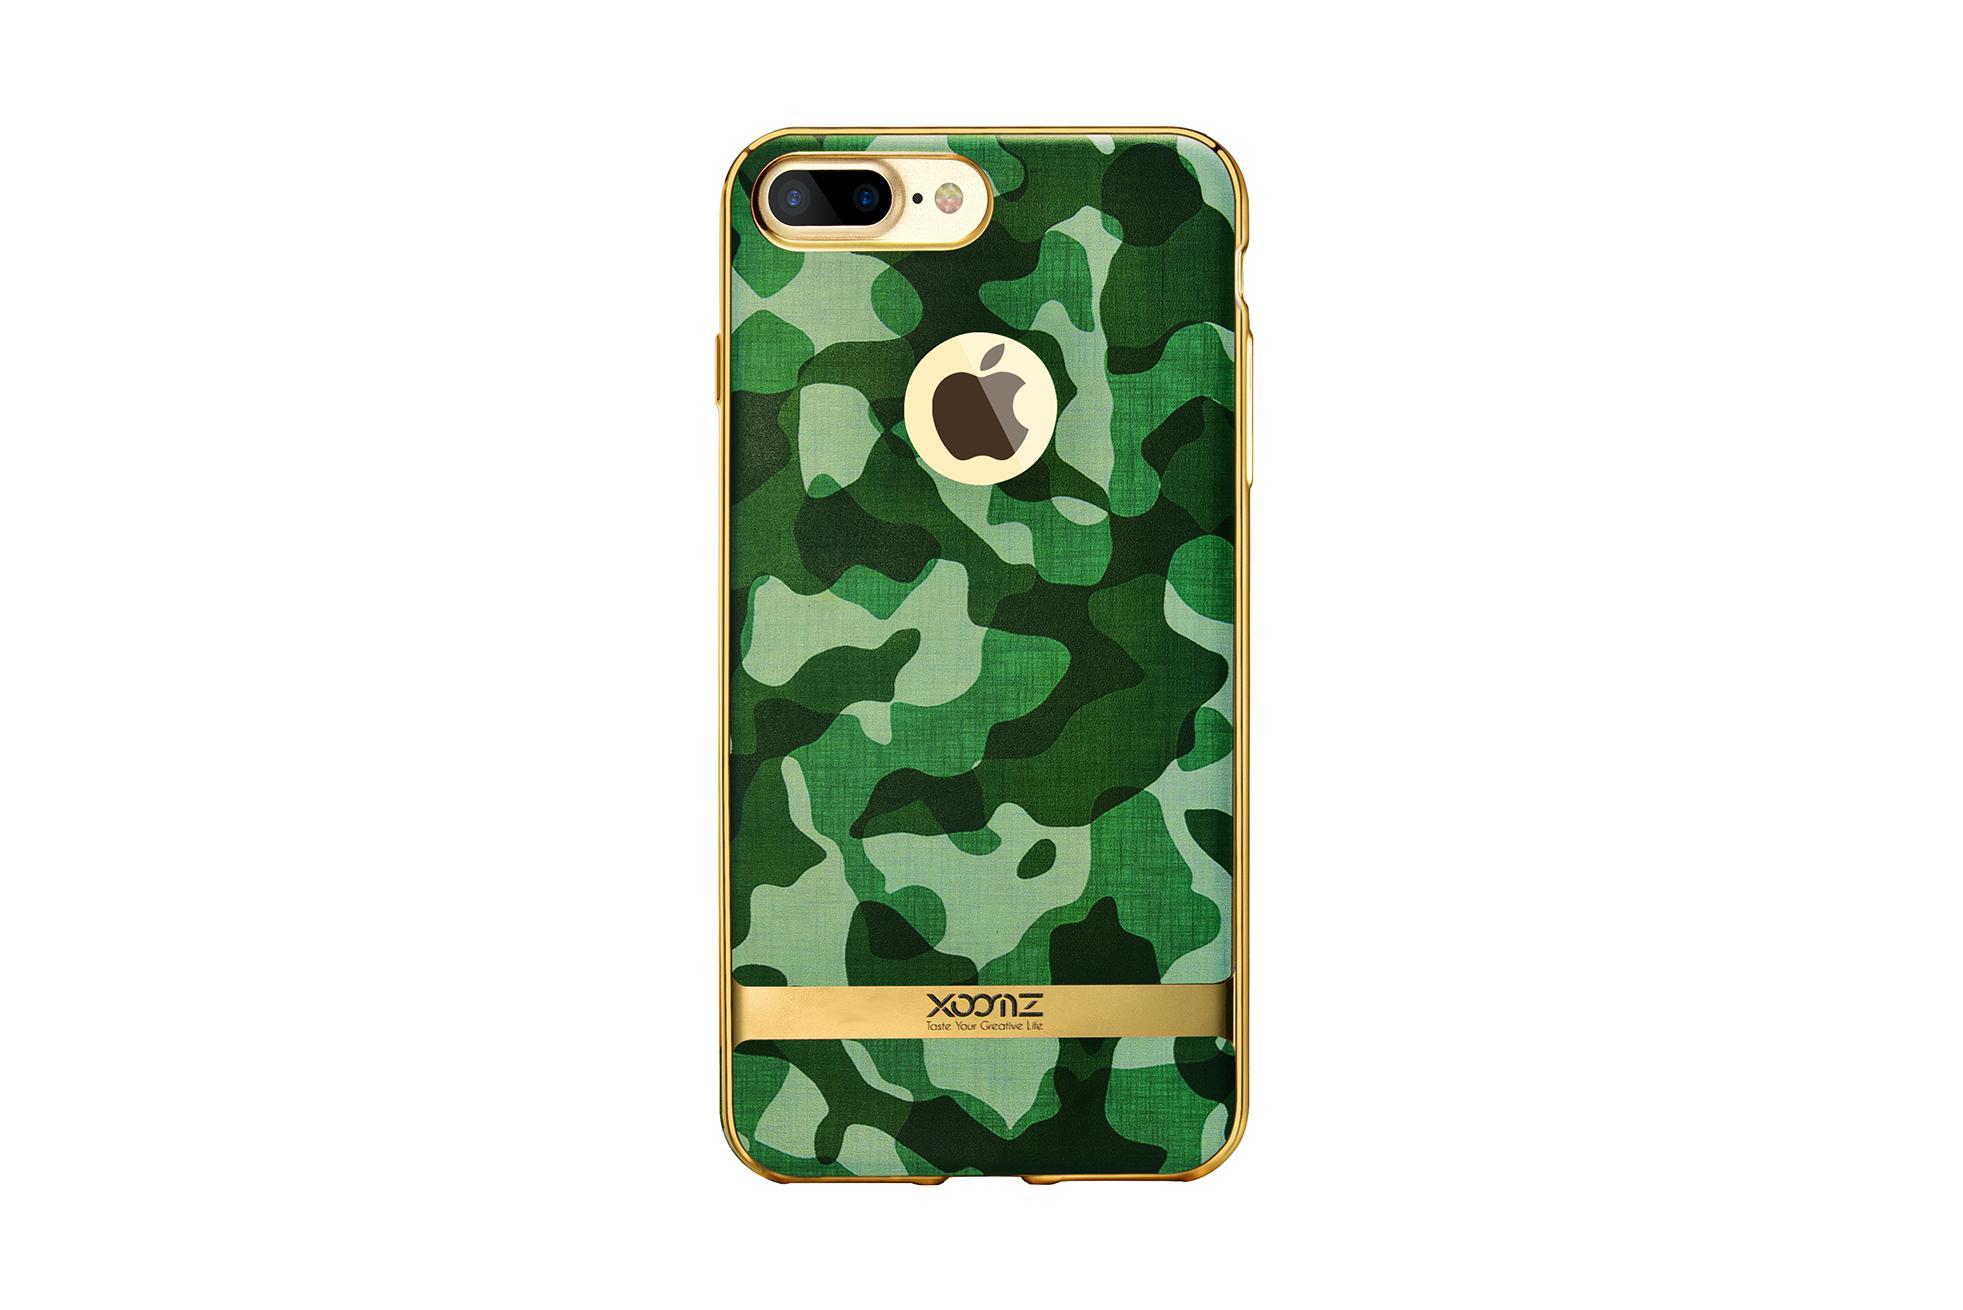 Xoomz iPhone 7 Plus Camouflage Pattern 3D Electroplating TPU Back Case 7